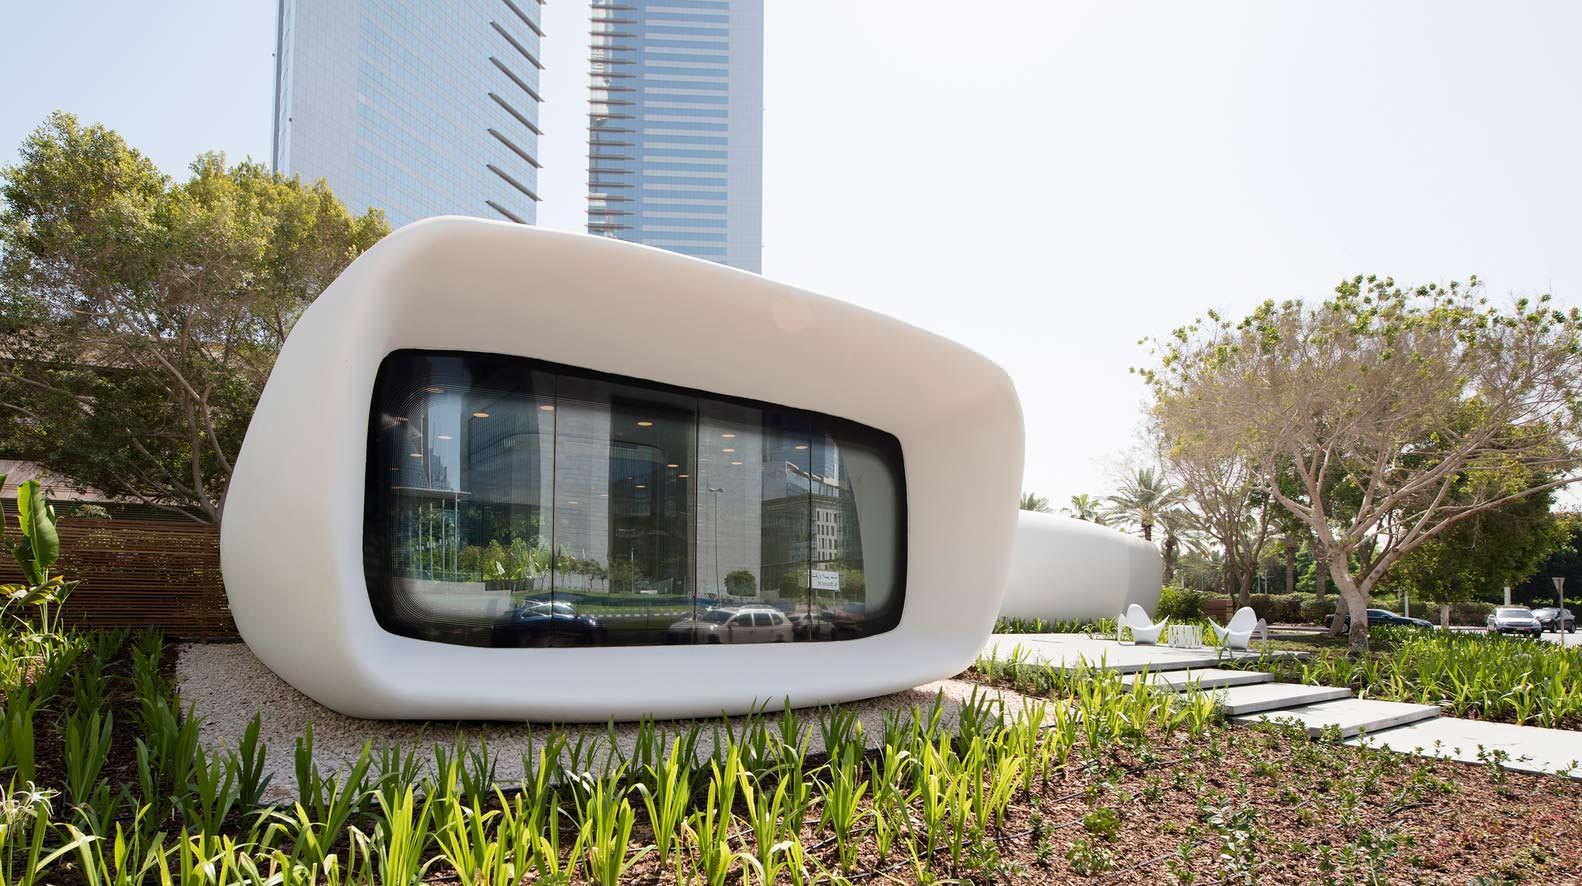 Здание, напечатанное на 3D-принтере Dubai Future Foundation